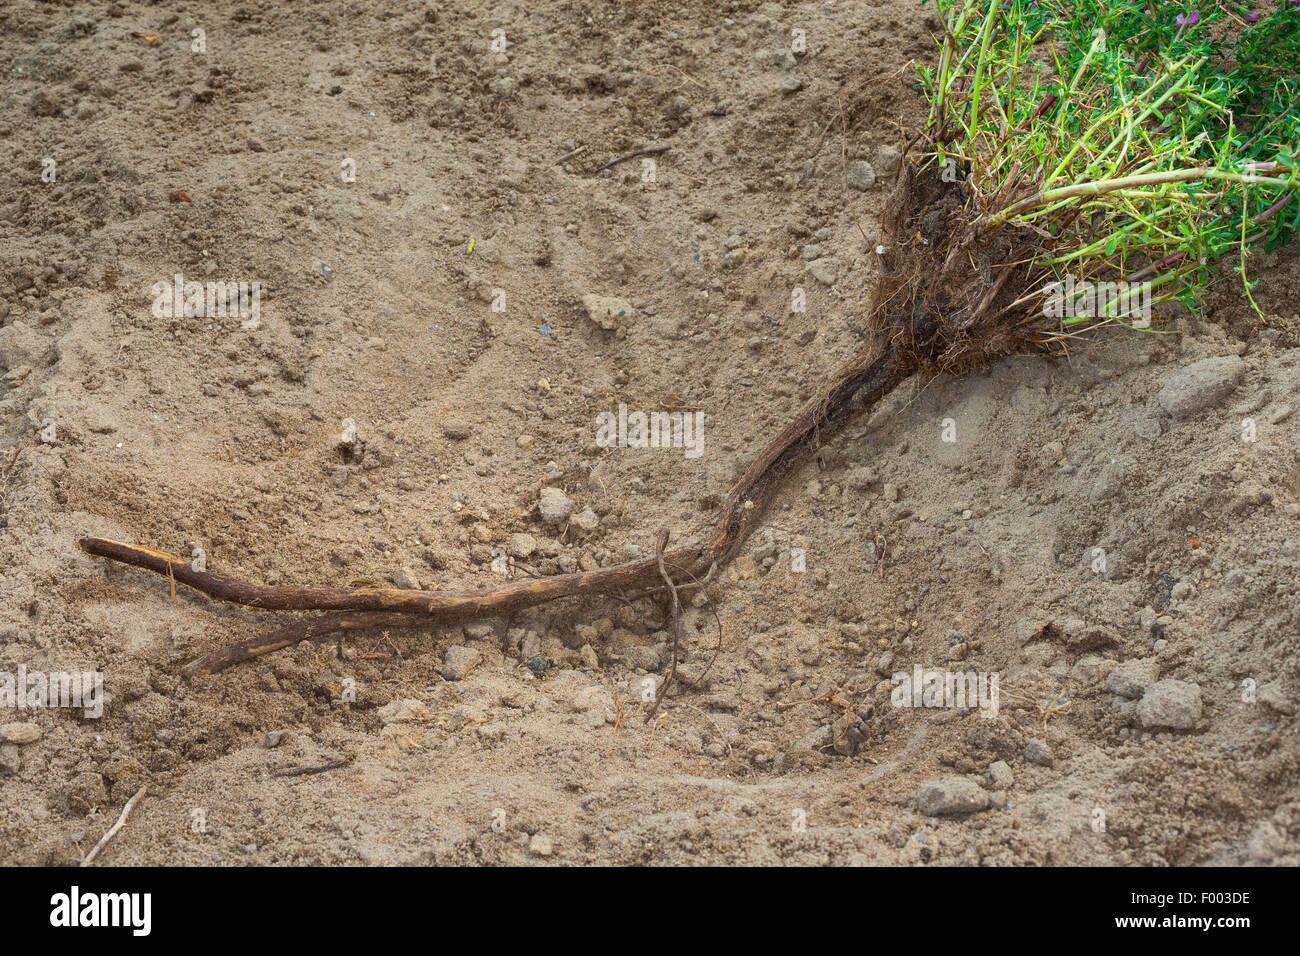 spiny restharrow (Ononis spinosa), root, Germany - Stock Image